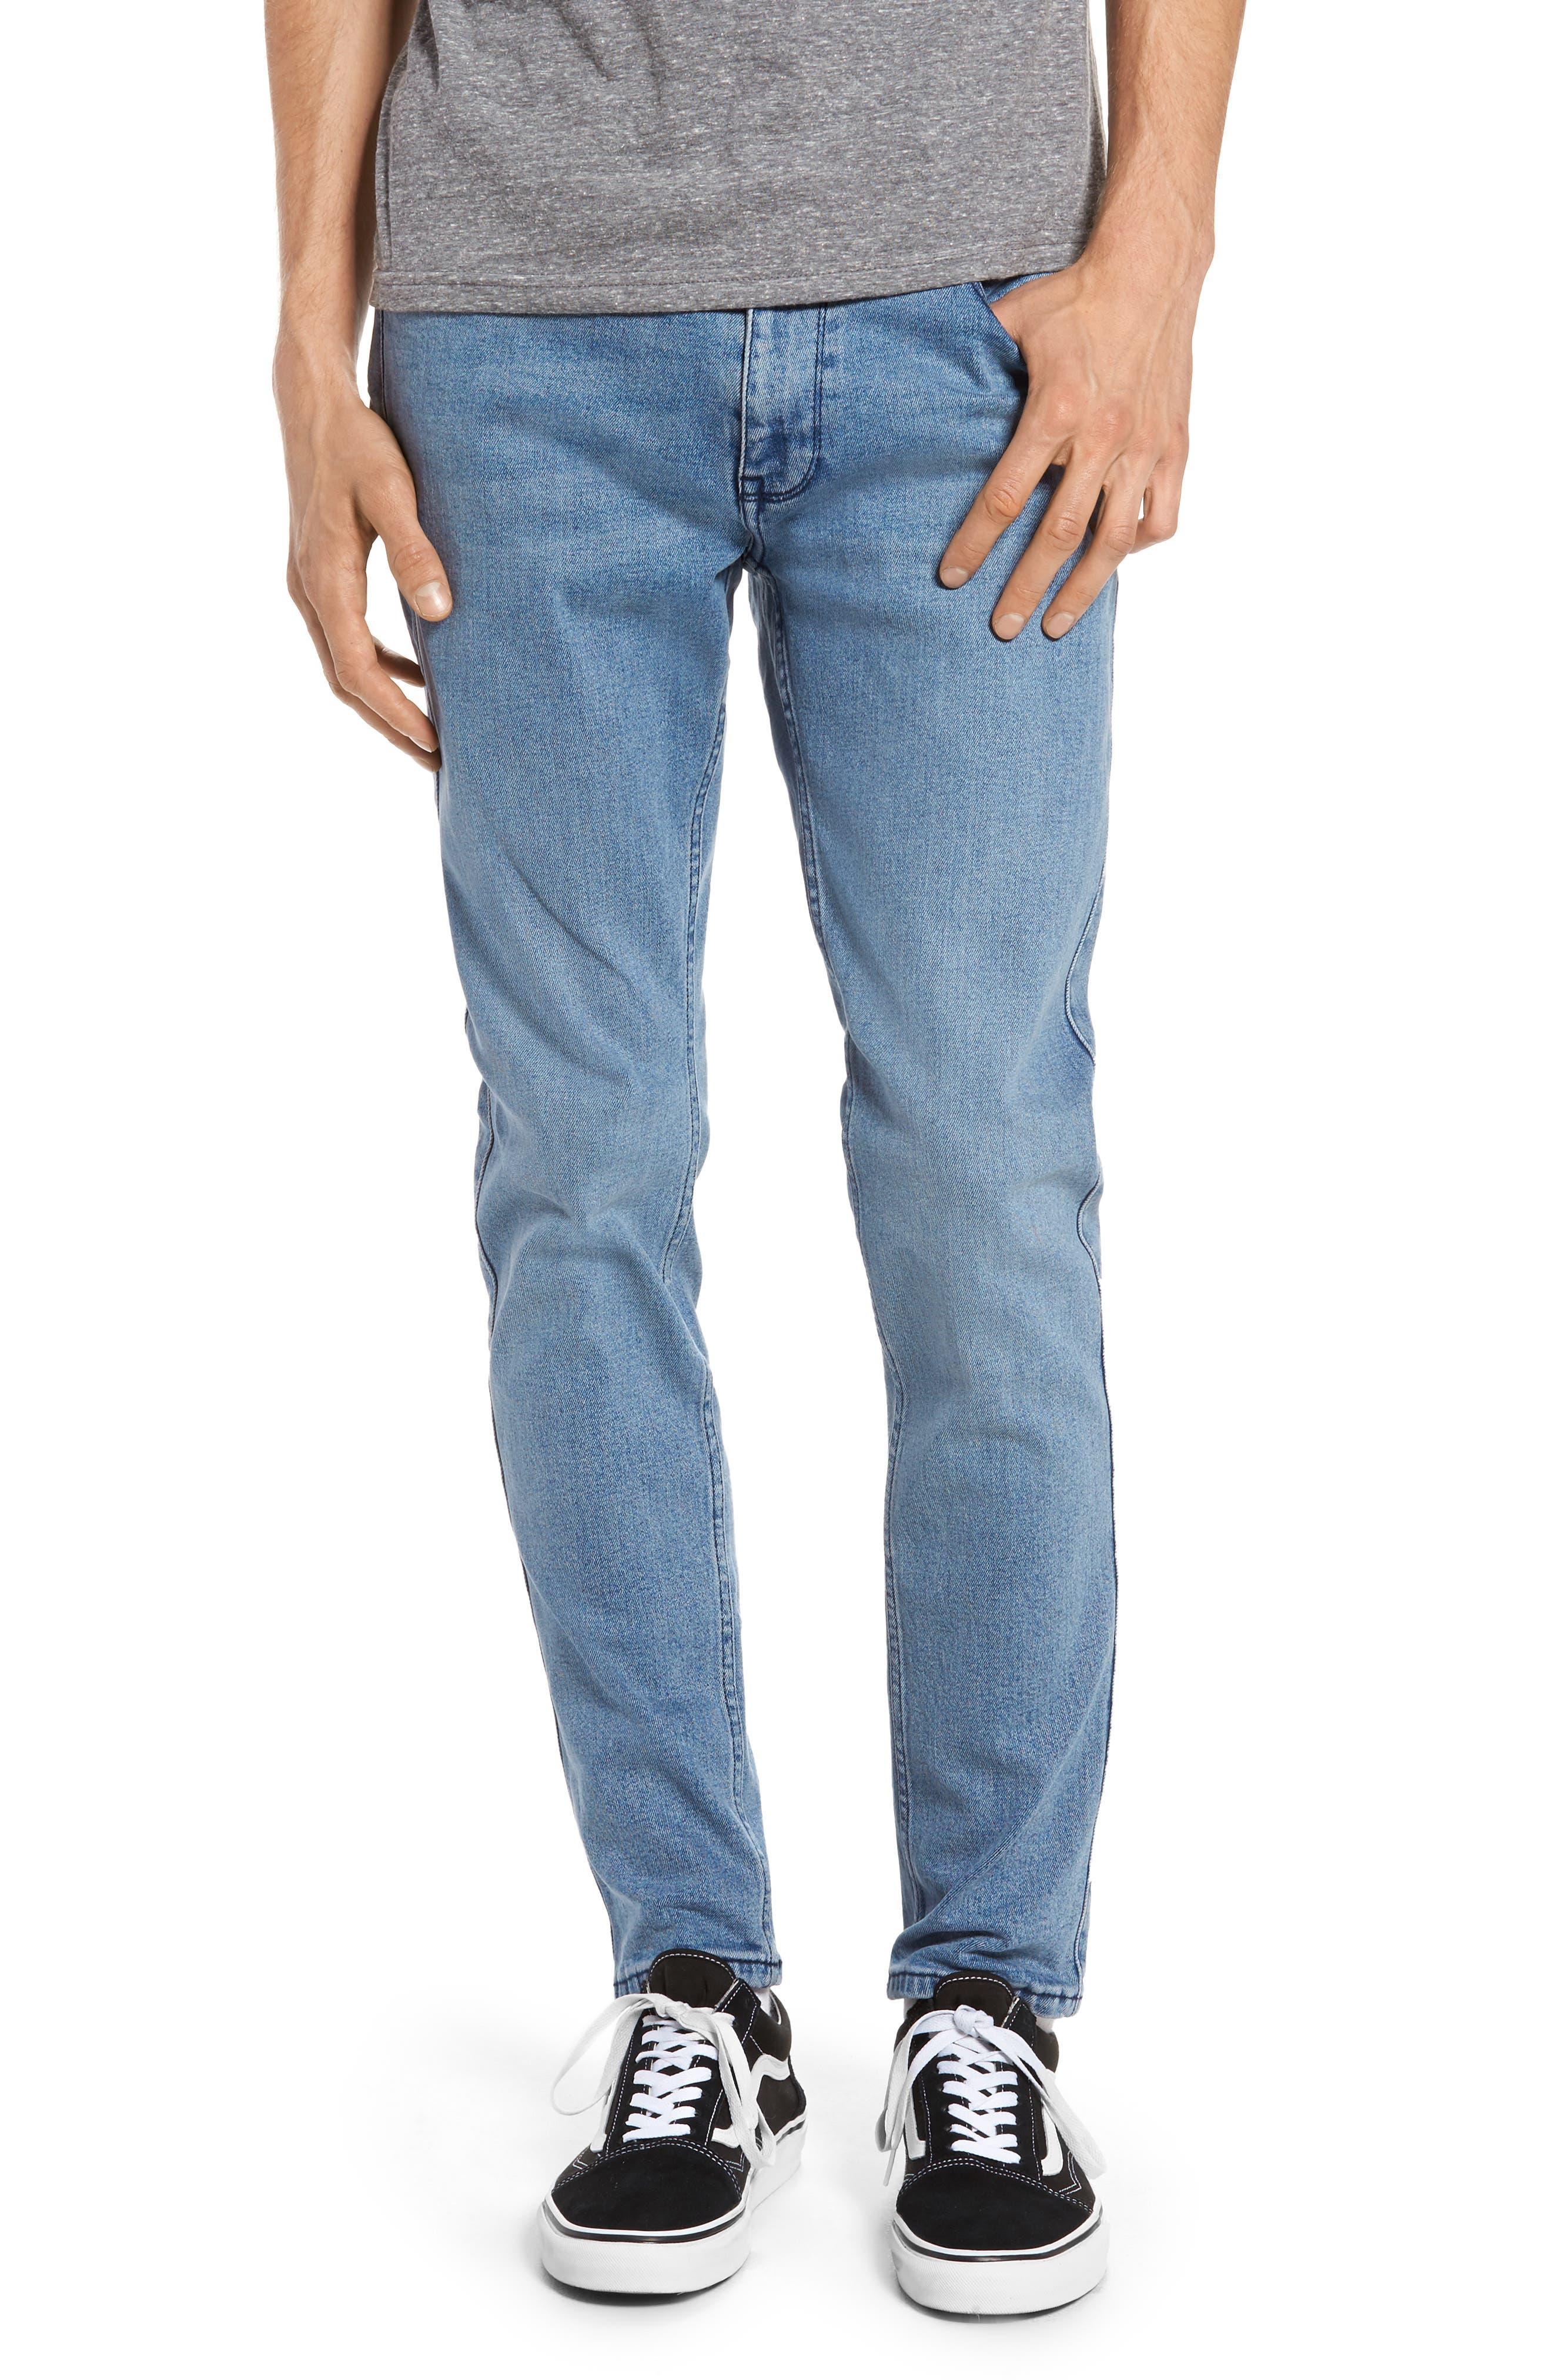 Clark Slim Straight Leg Jeans,                         Main,                         color, Worn Light Retro